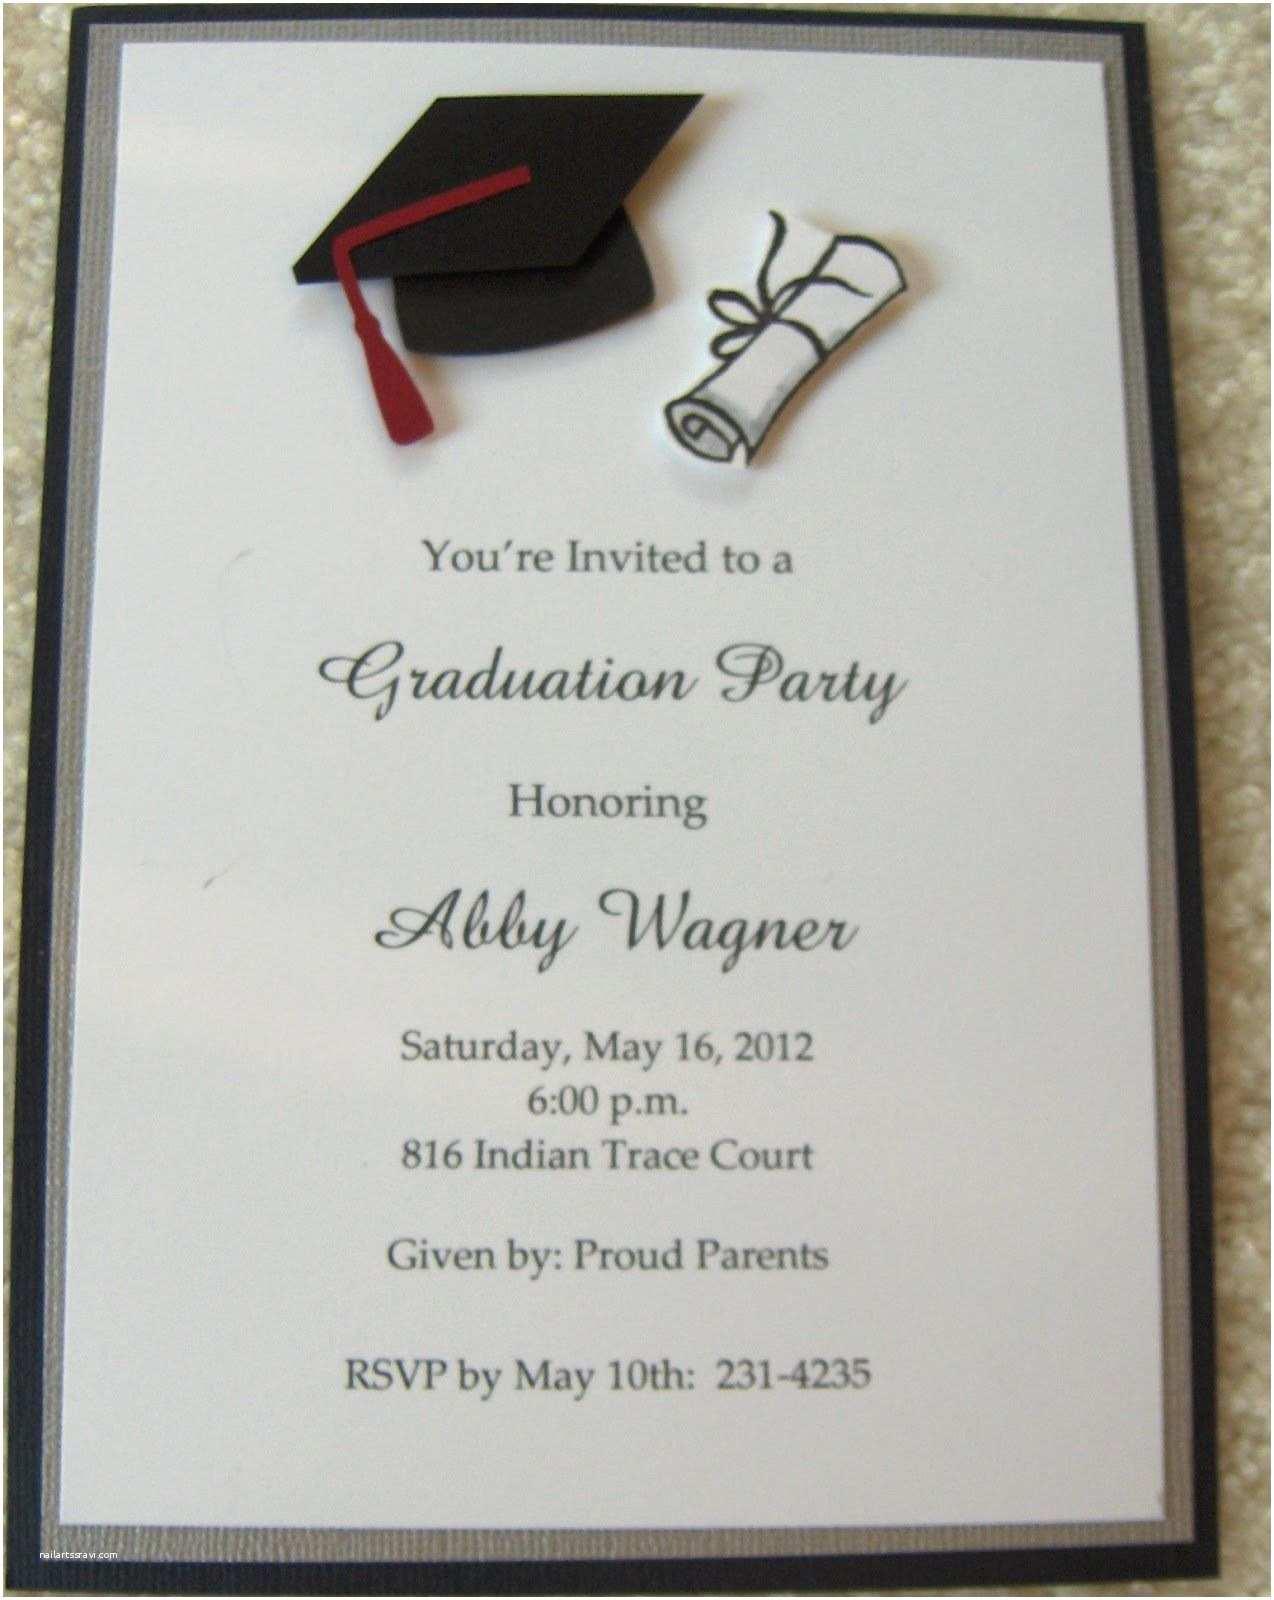 Graduation Party Invitations Ideas Graduation Invitations Google Search